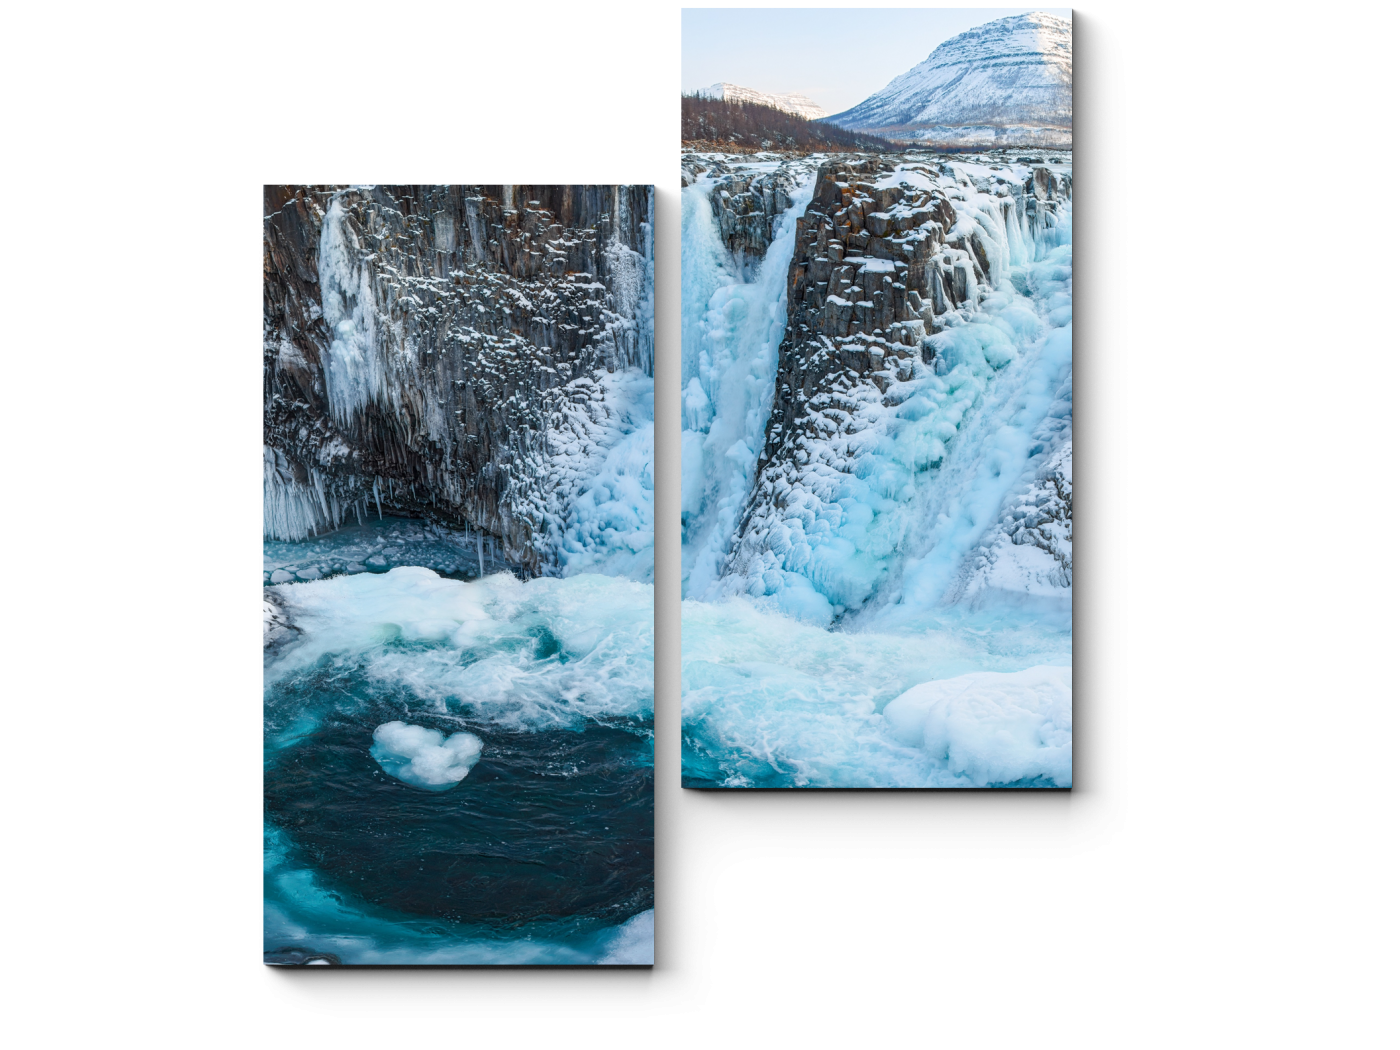 Модульная картина Водопад в плато Путорана (40x50) фото